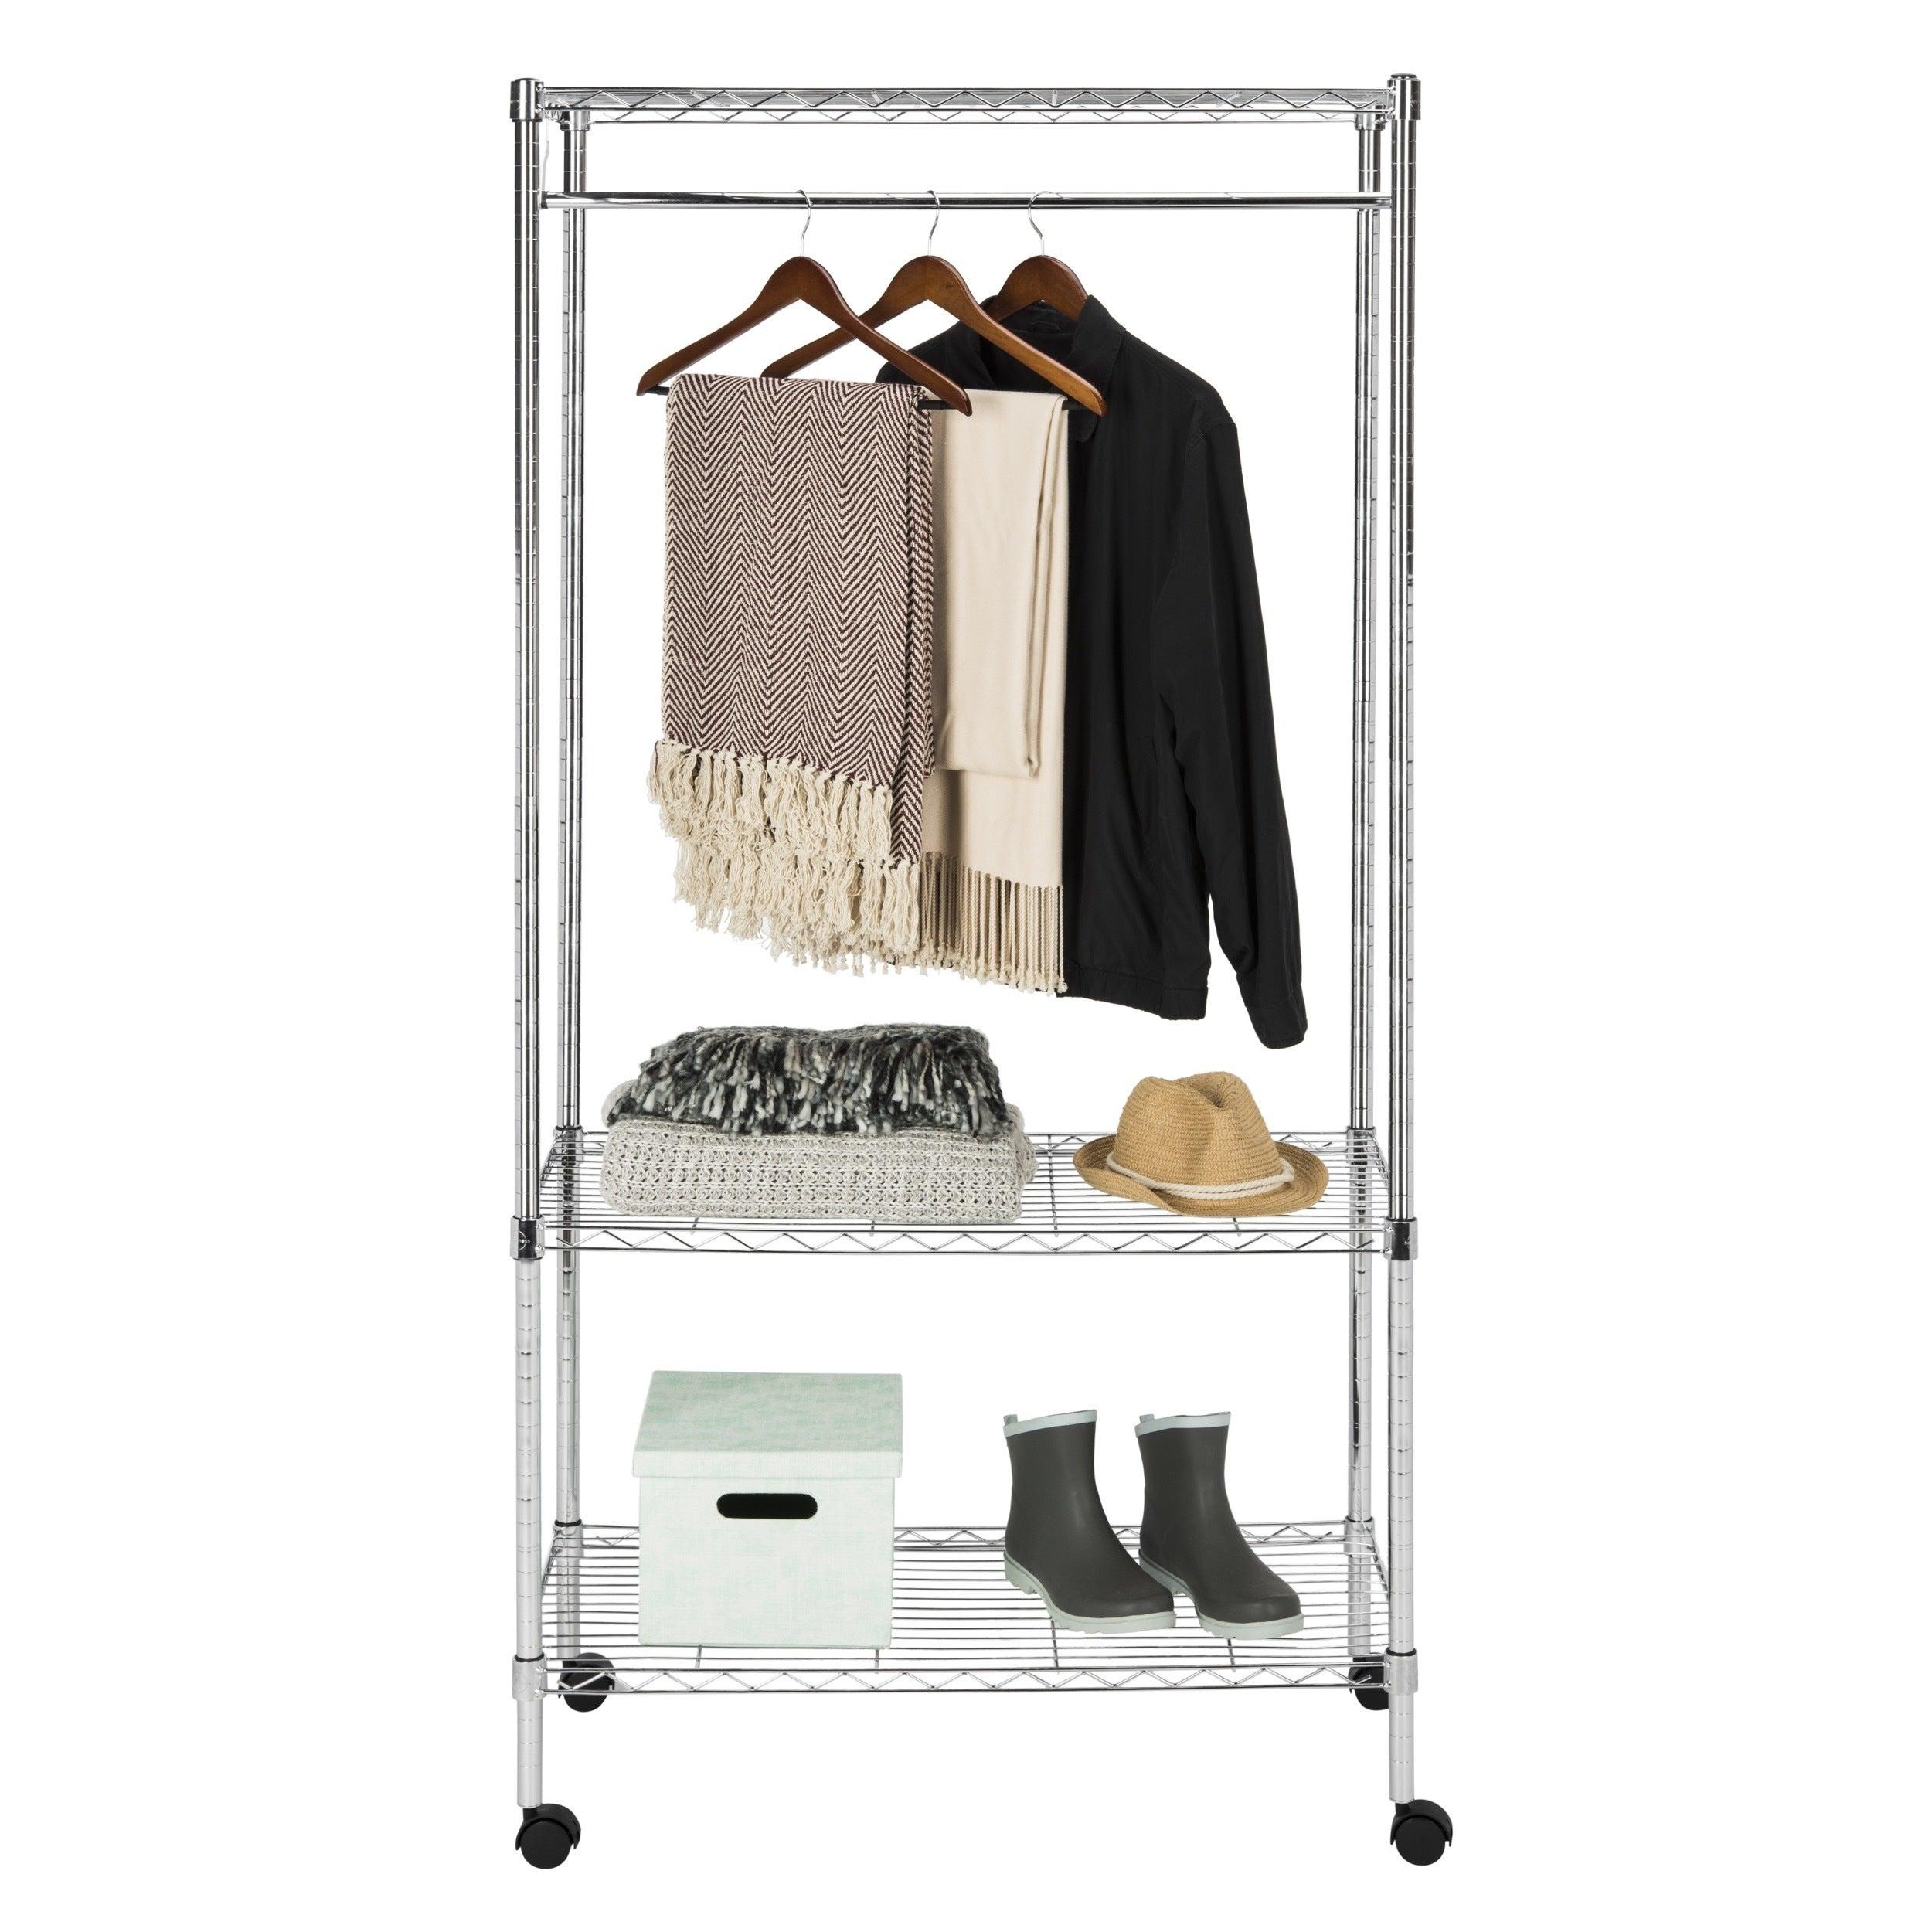 ip garment clothes rack whitmor black metal com chrome walmart adjustable